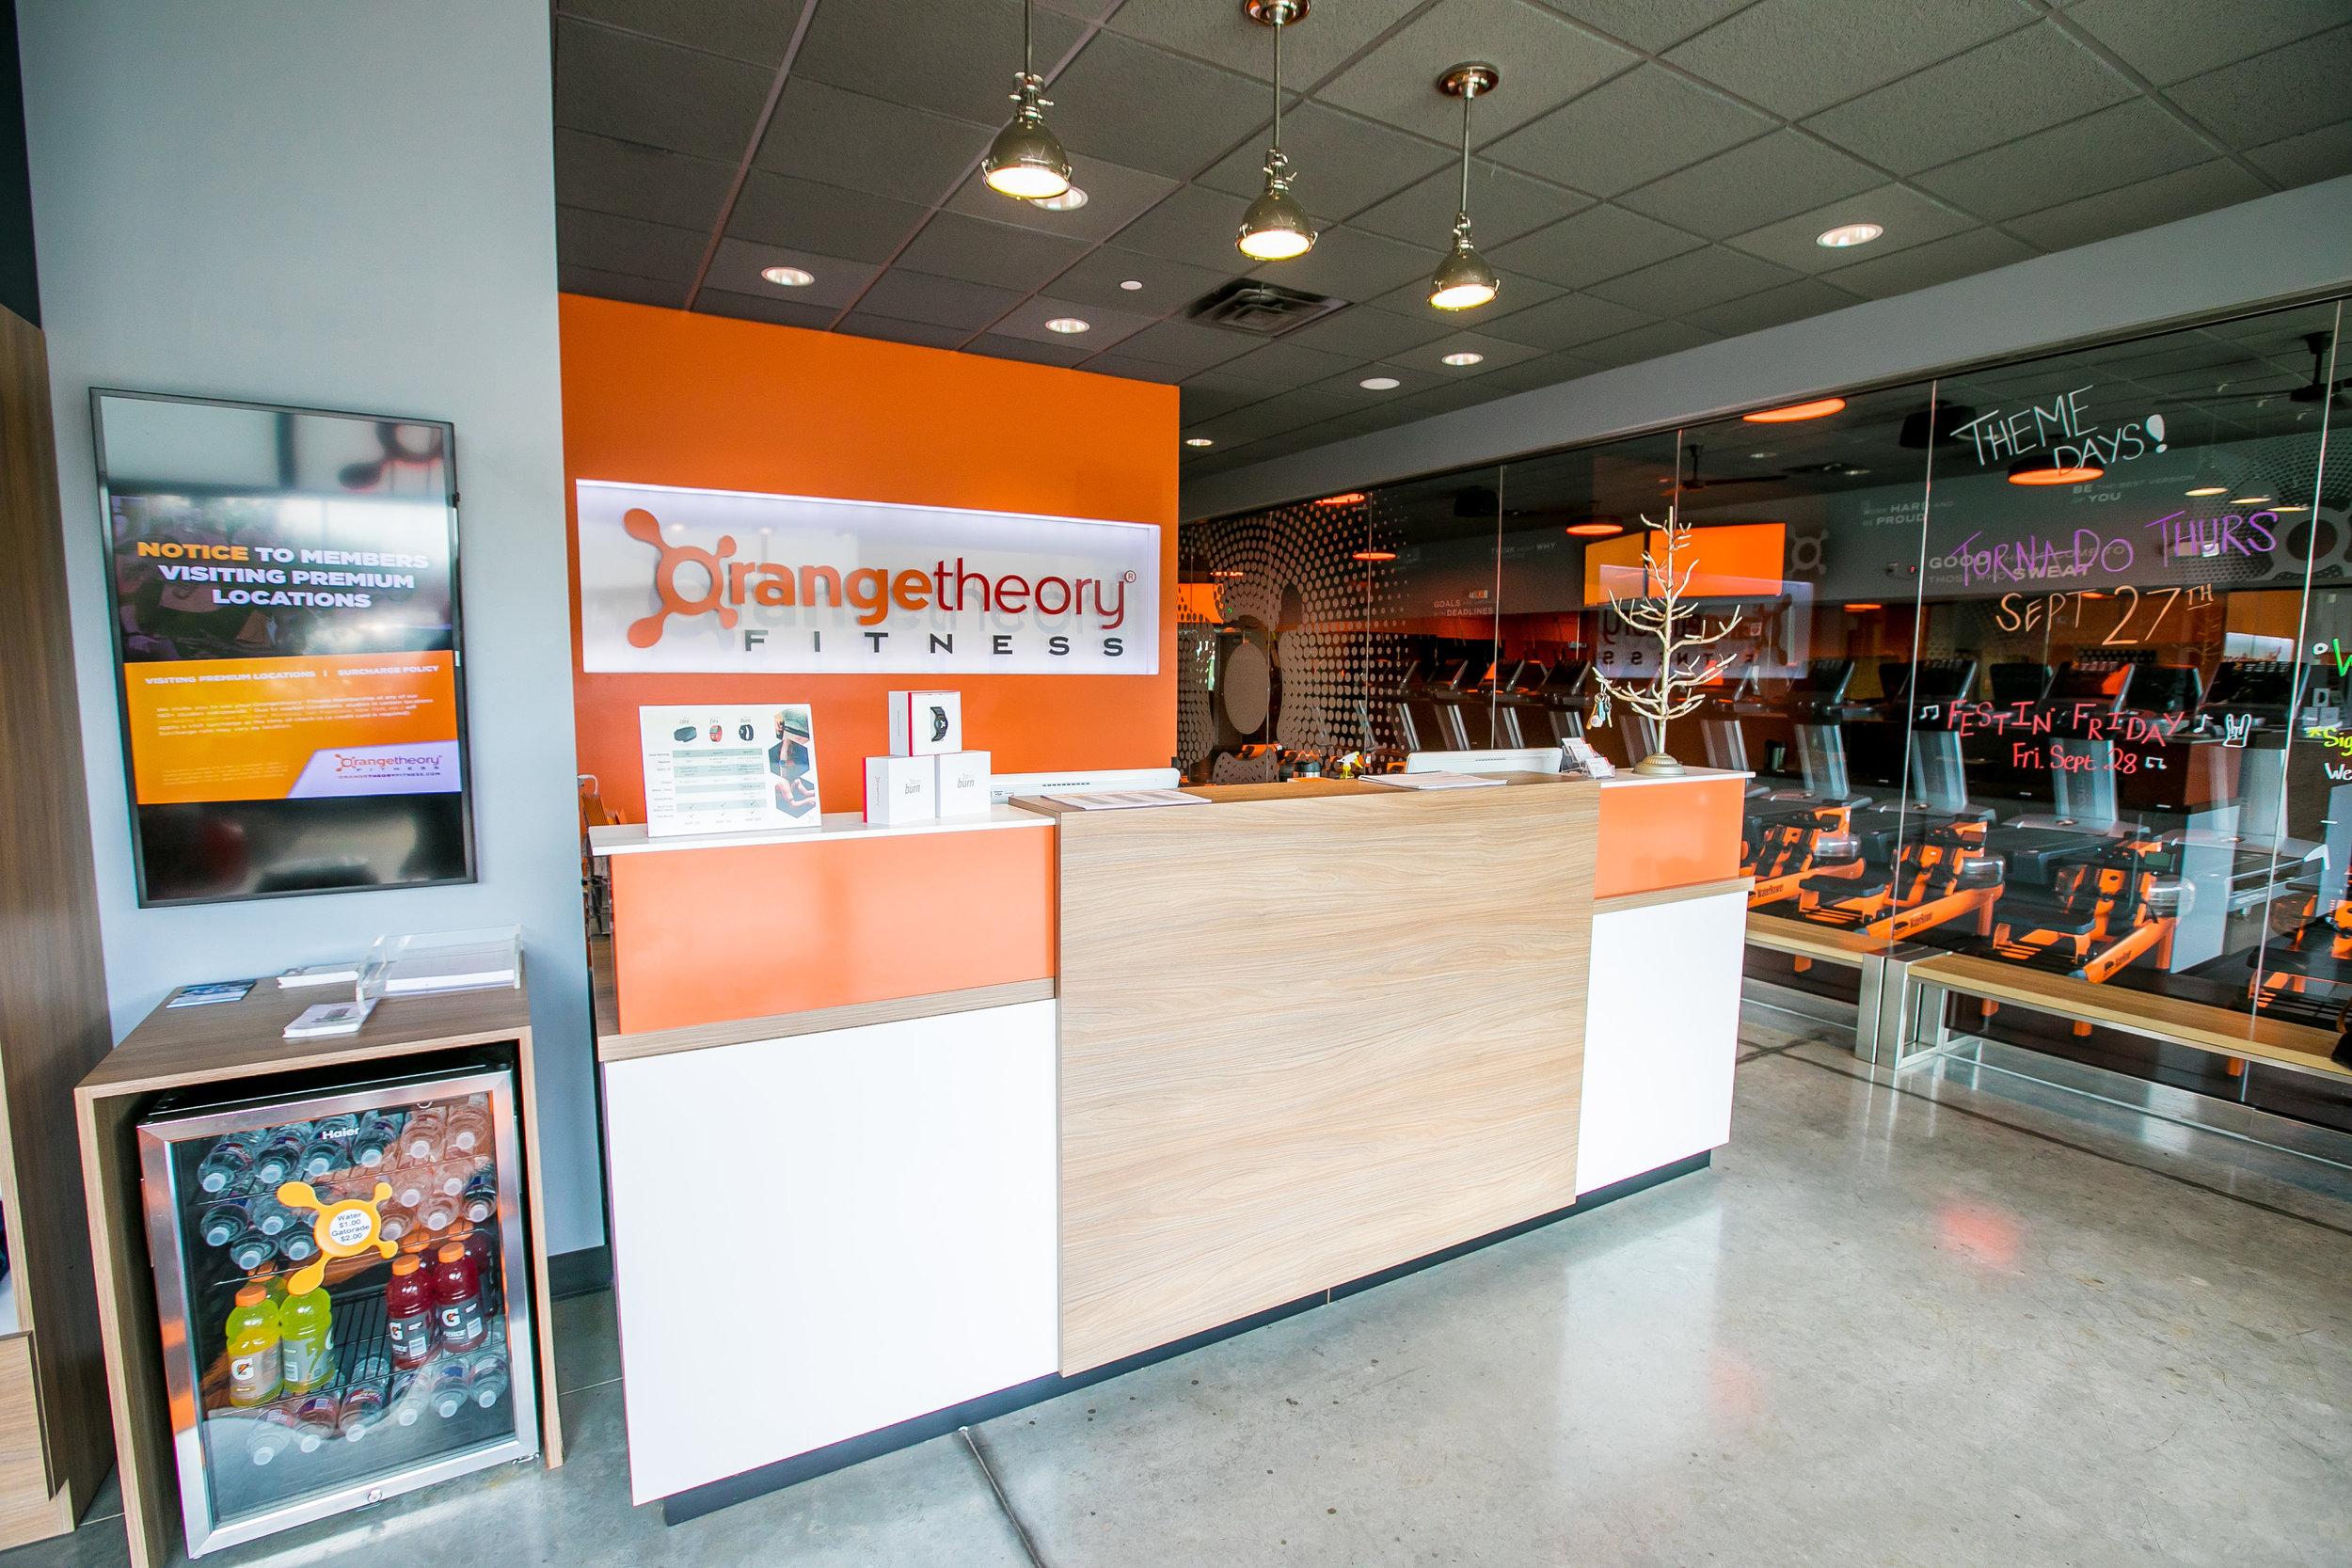 orangetheory2.jpg